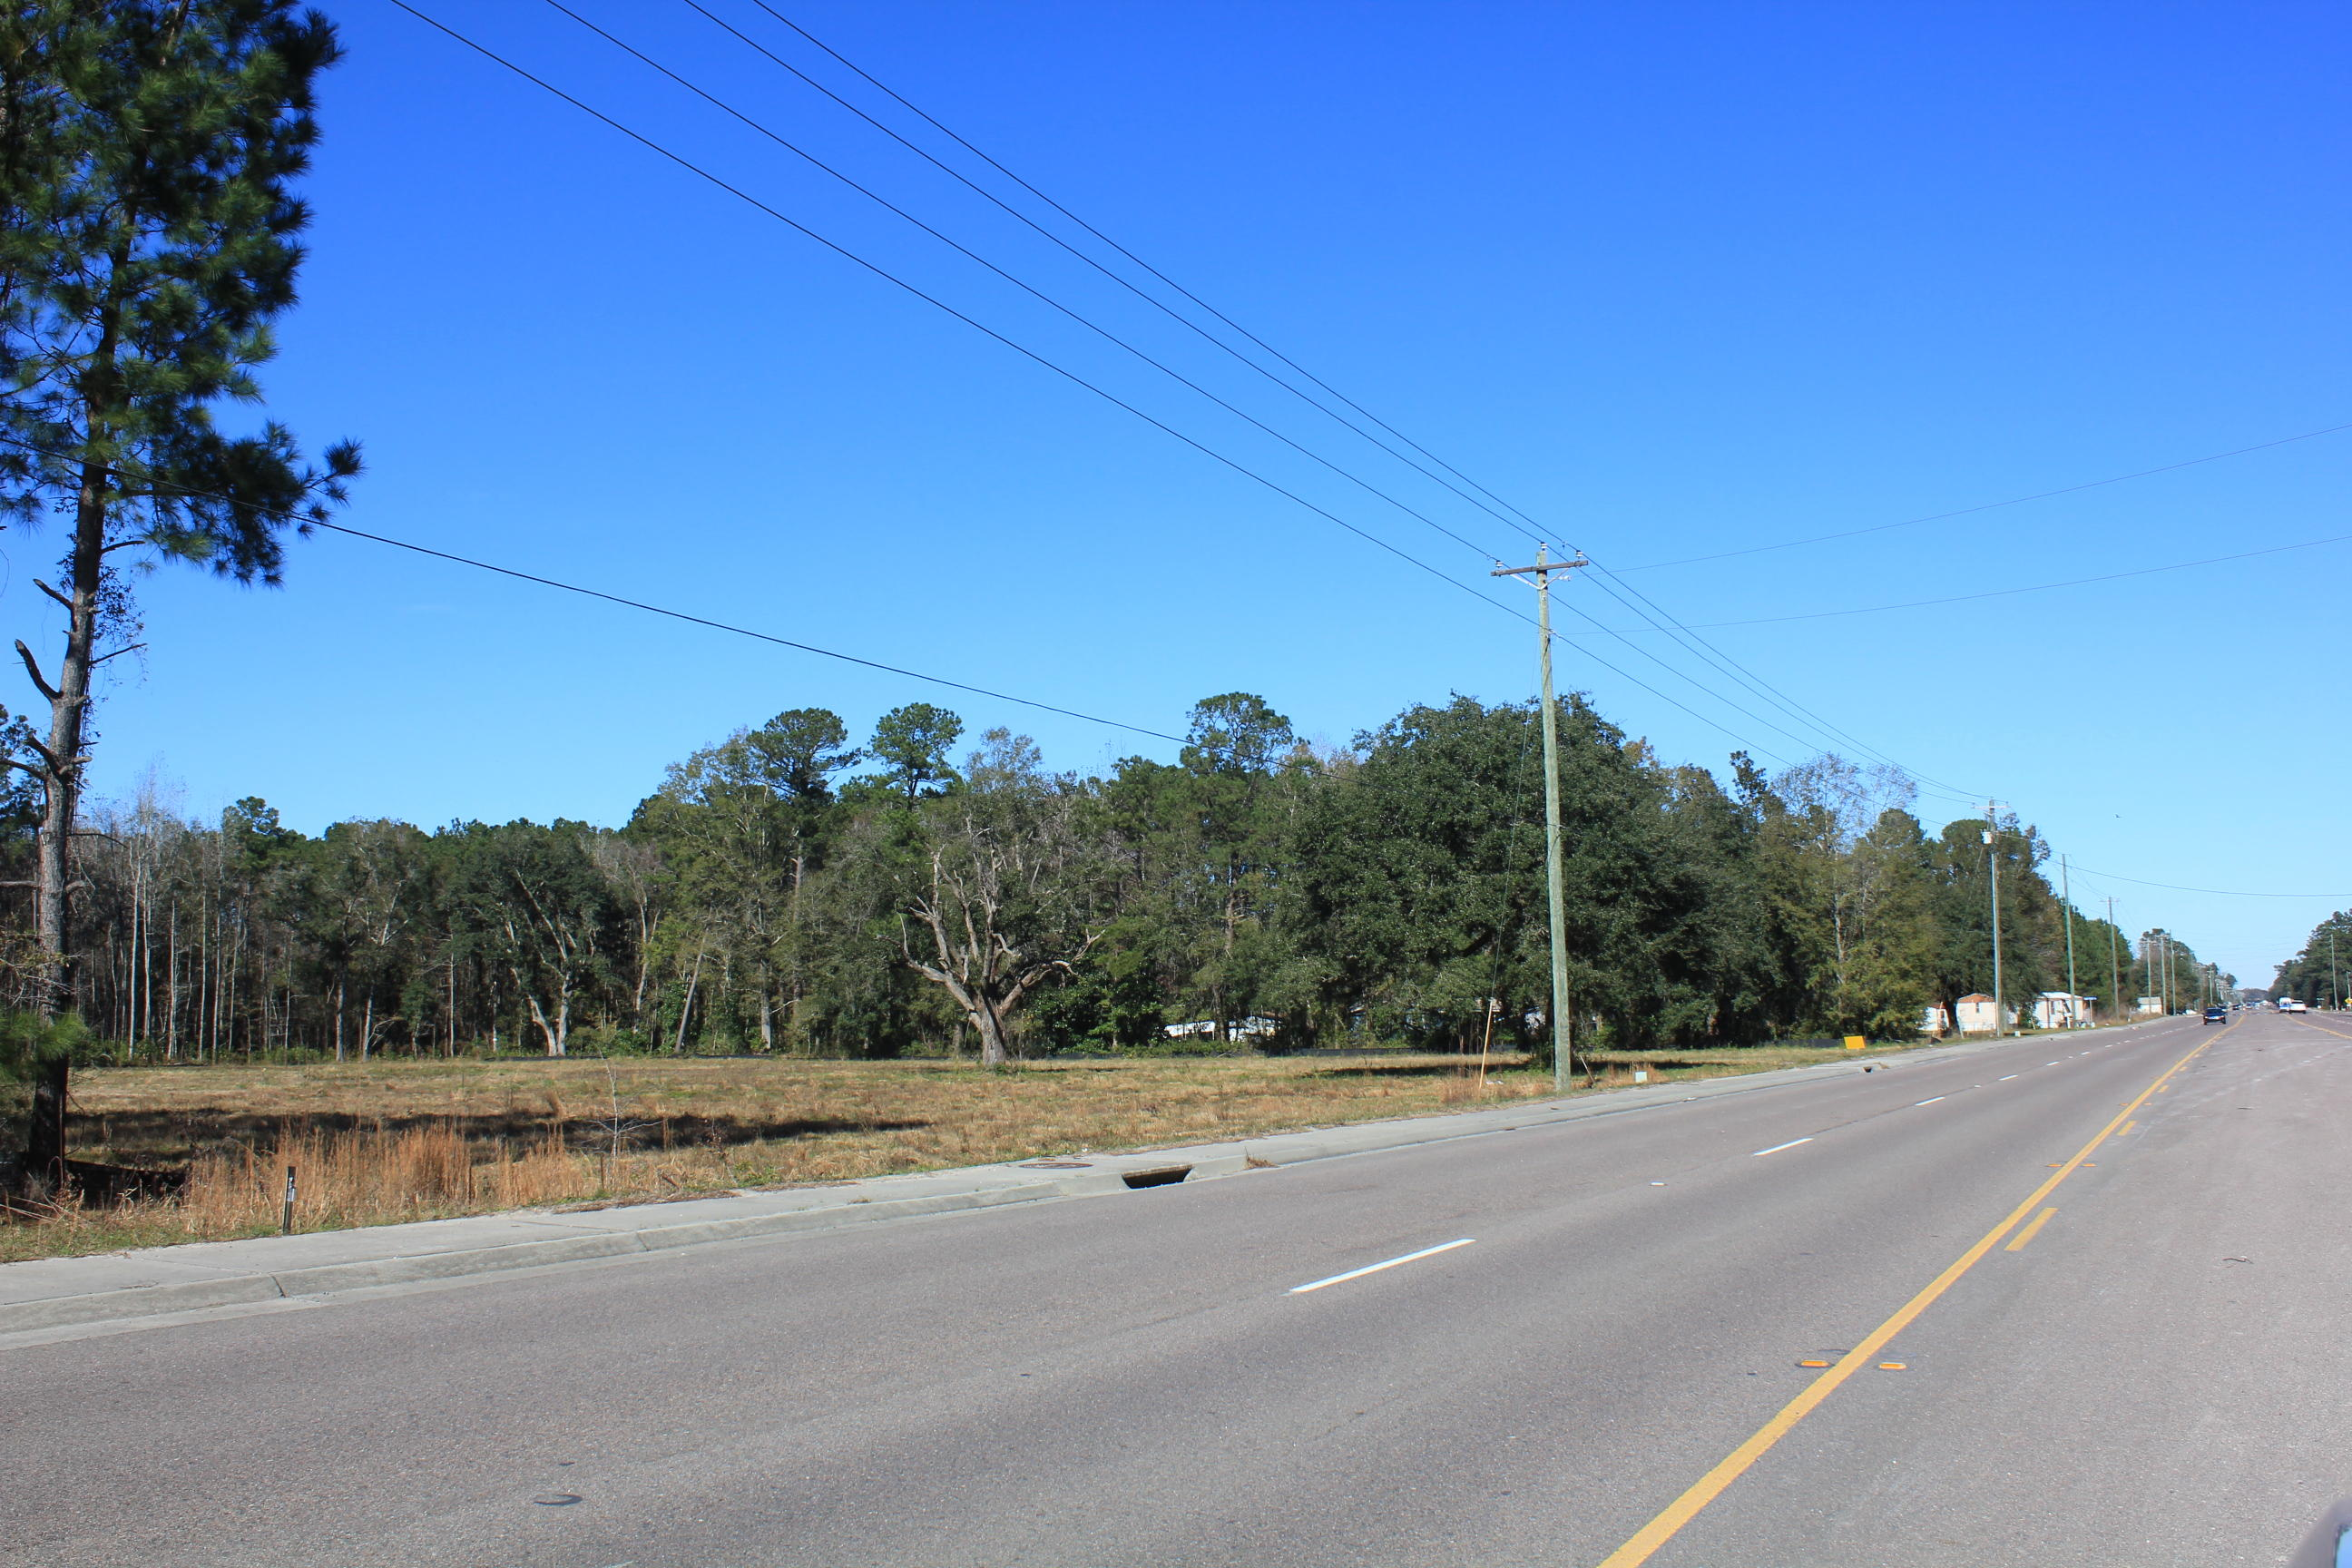 Highway 17a Moncks Corner, SC 29461